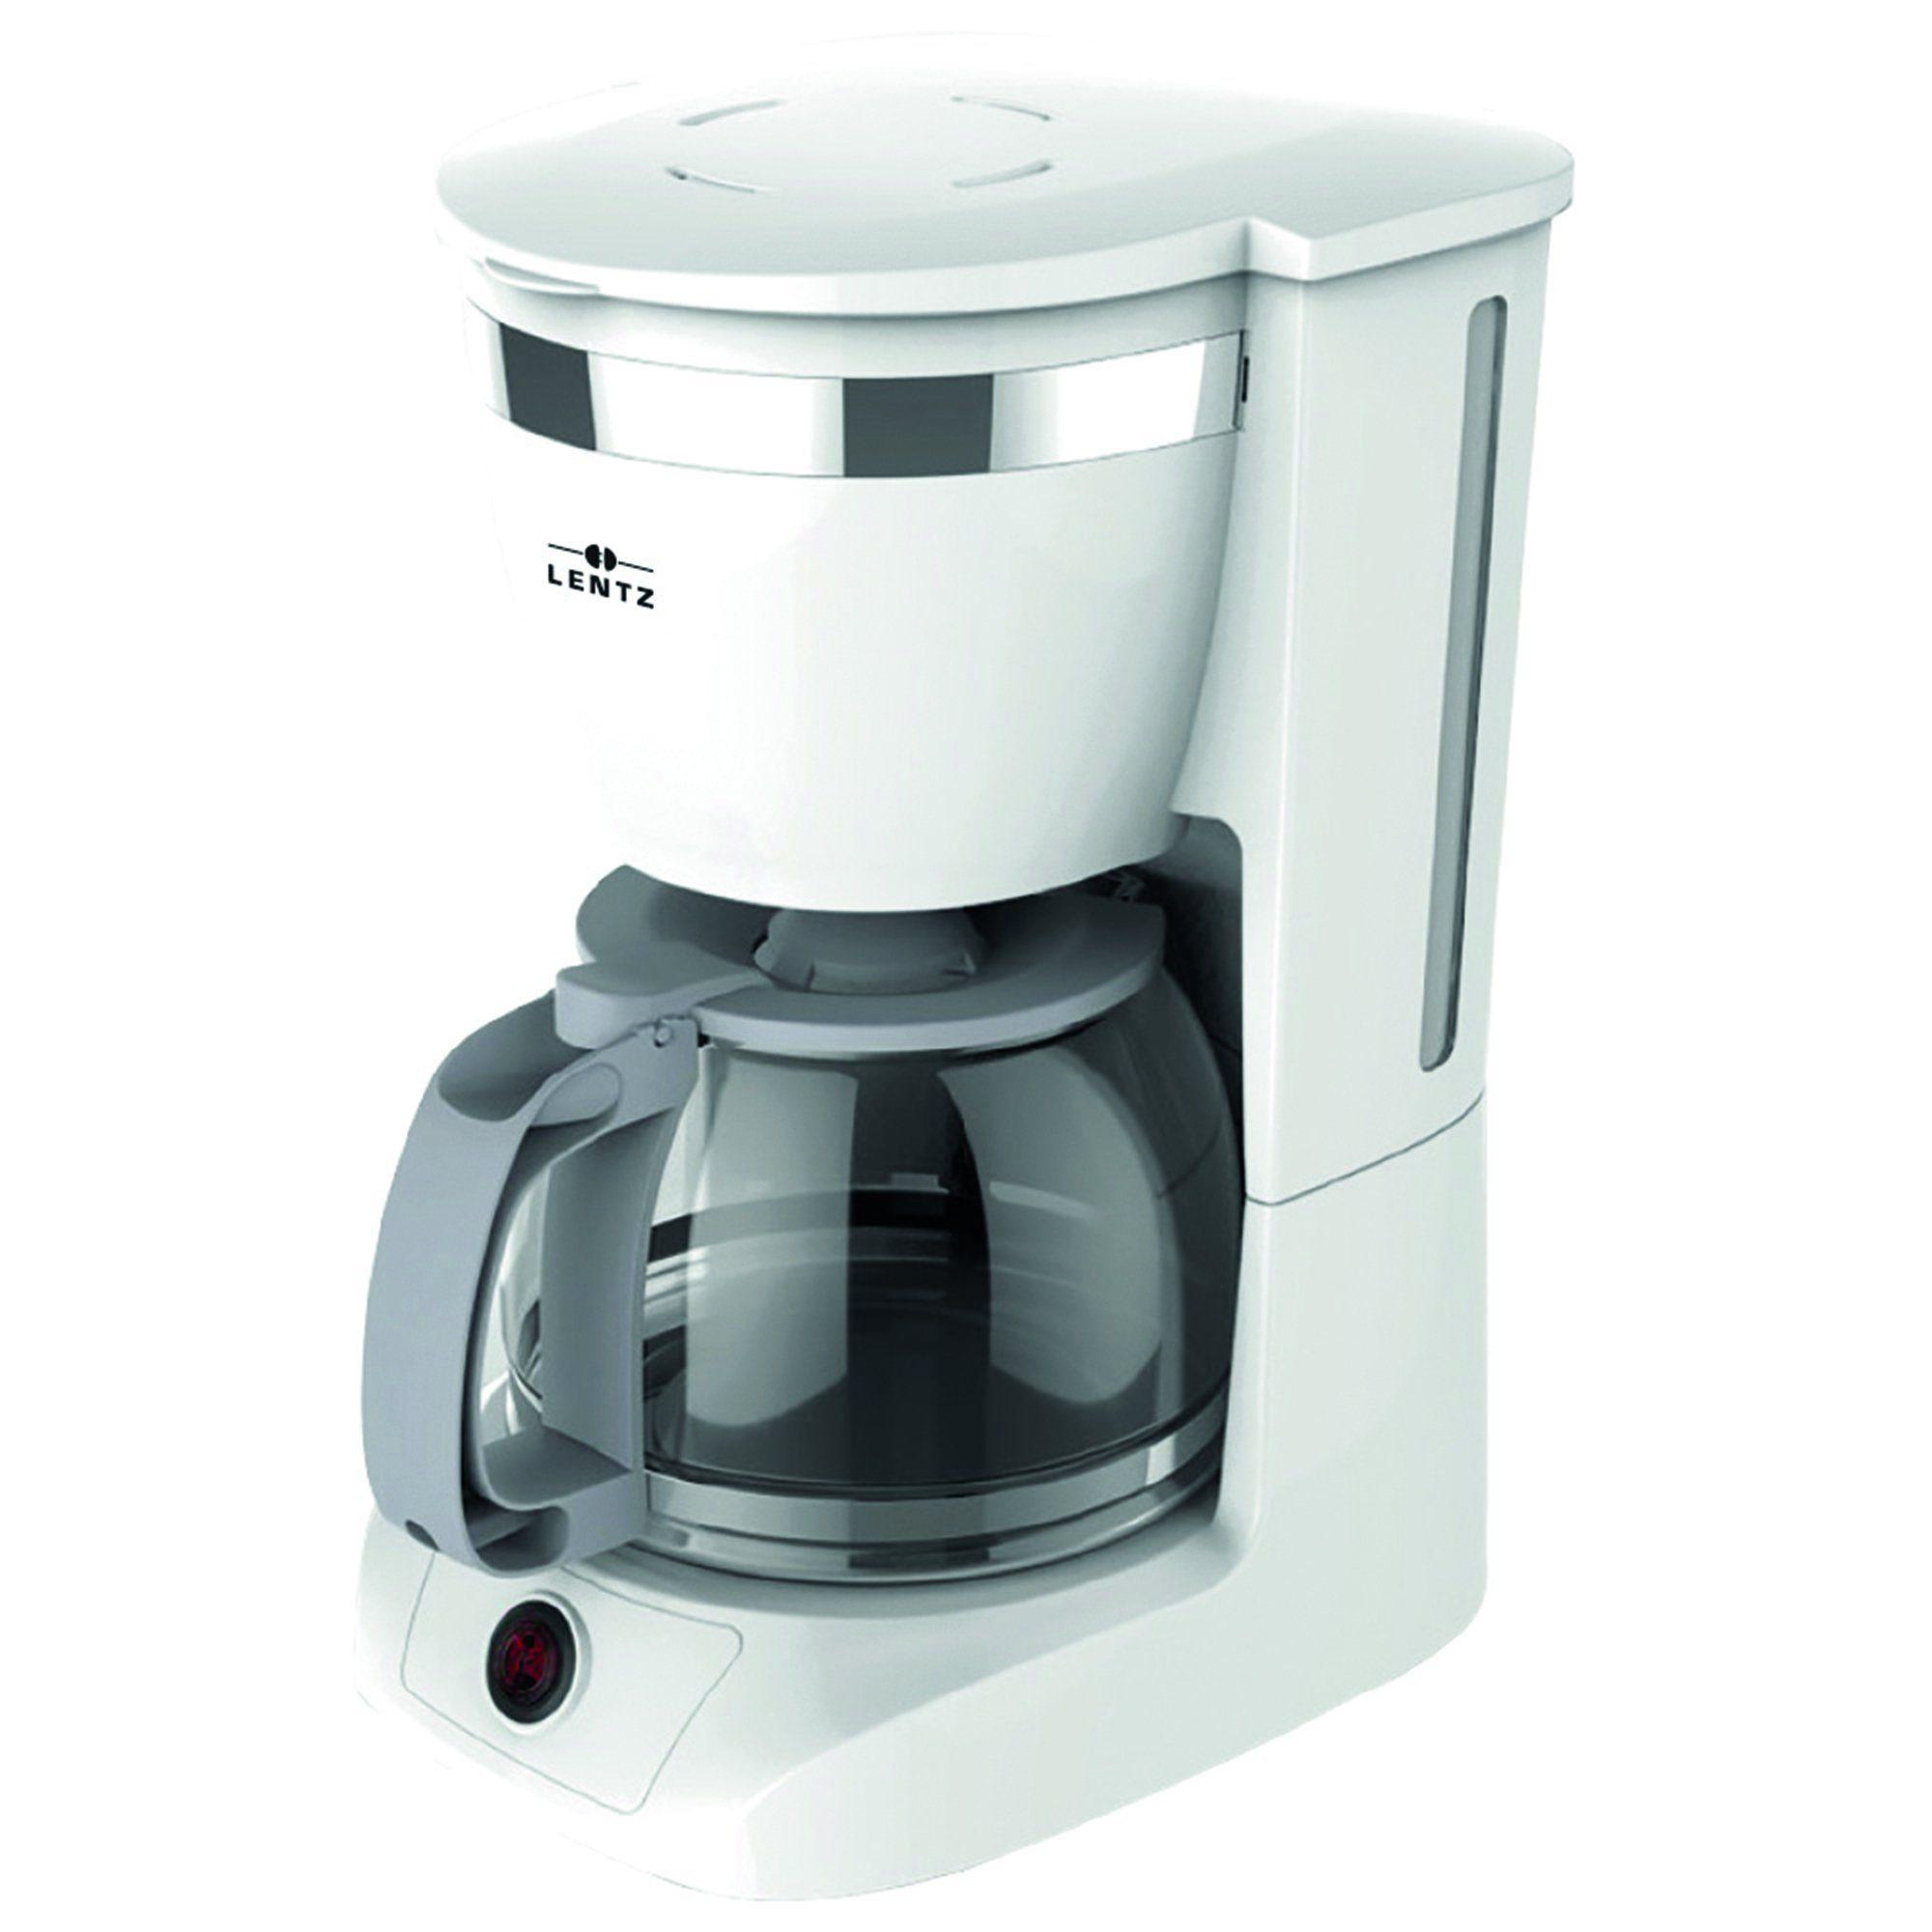 ProfiCook Kaffeemaschine 0,6L 600W Filterkaffeemaschine Espressomaschine